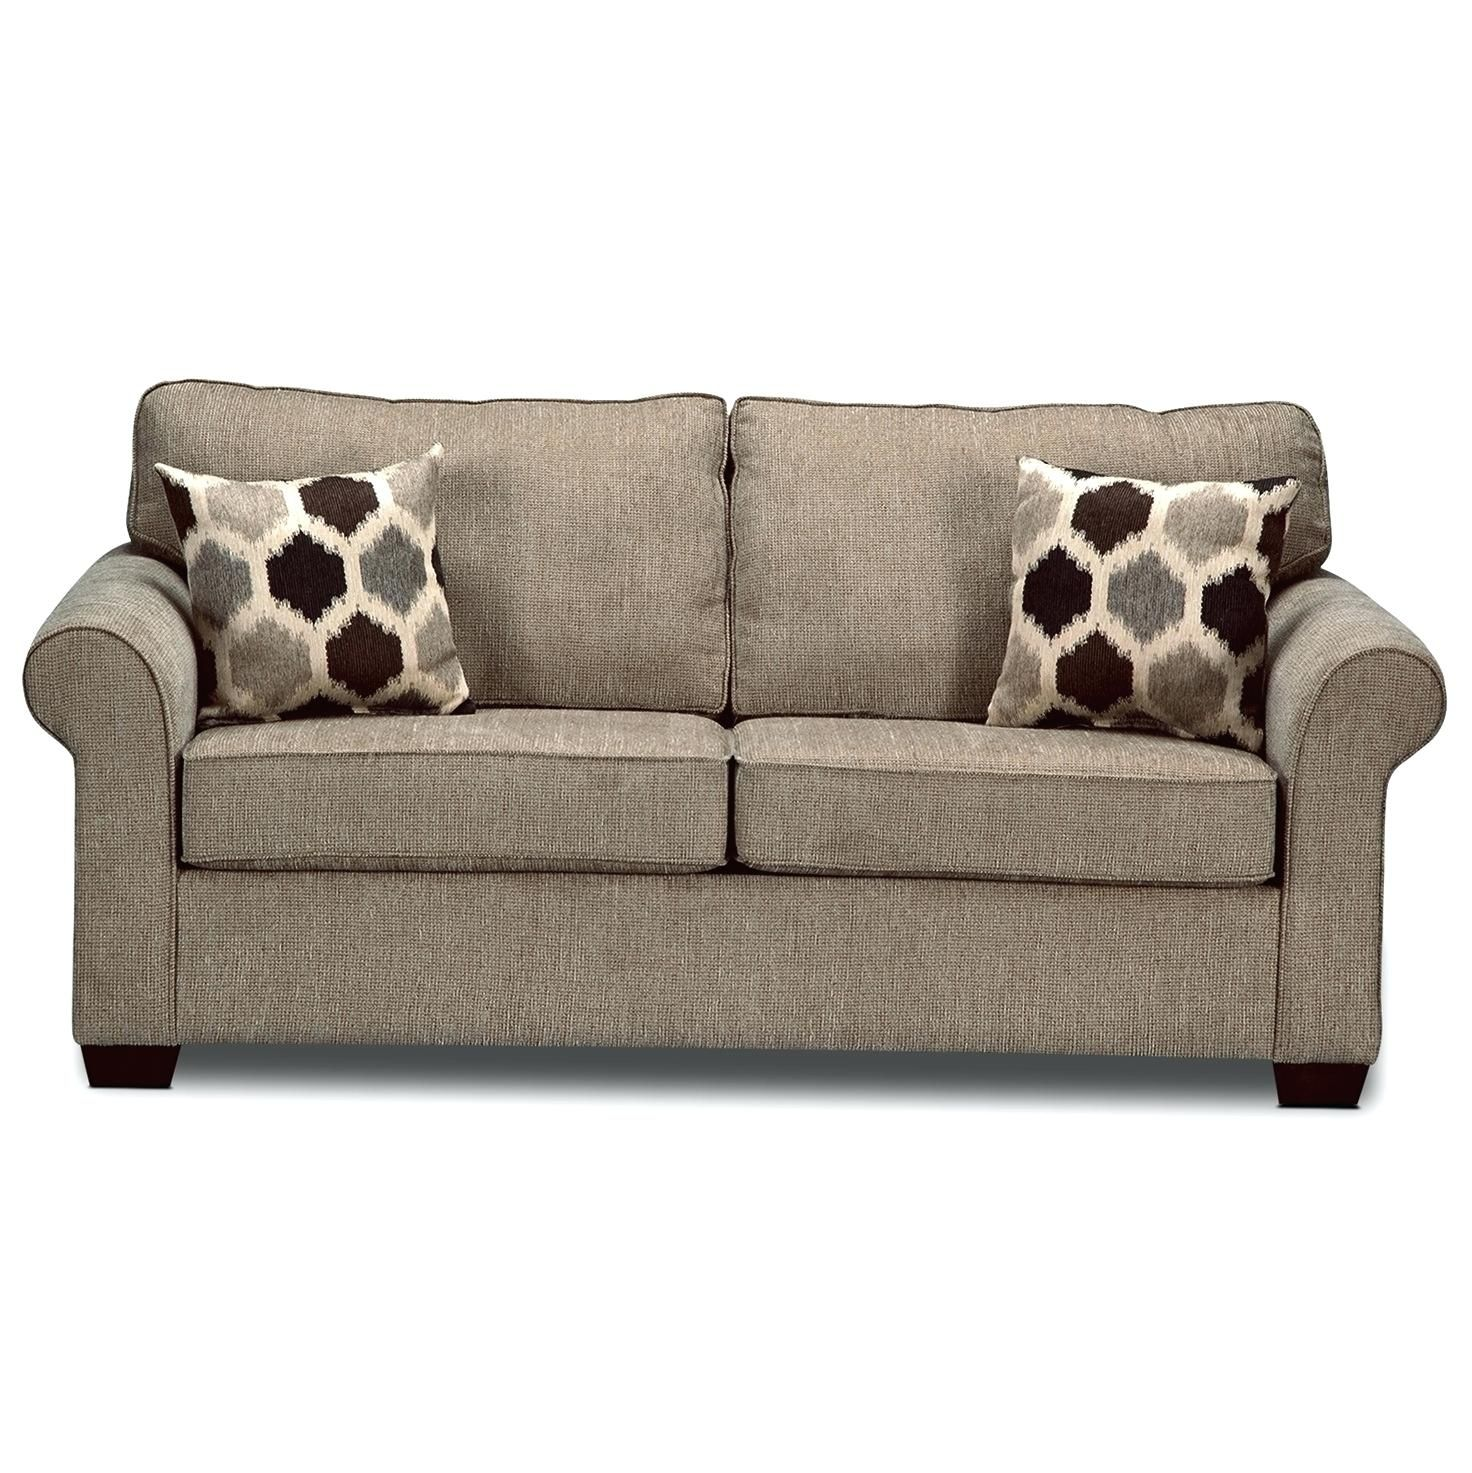 Twin Sofa Bed Sheet Set